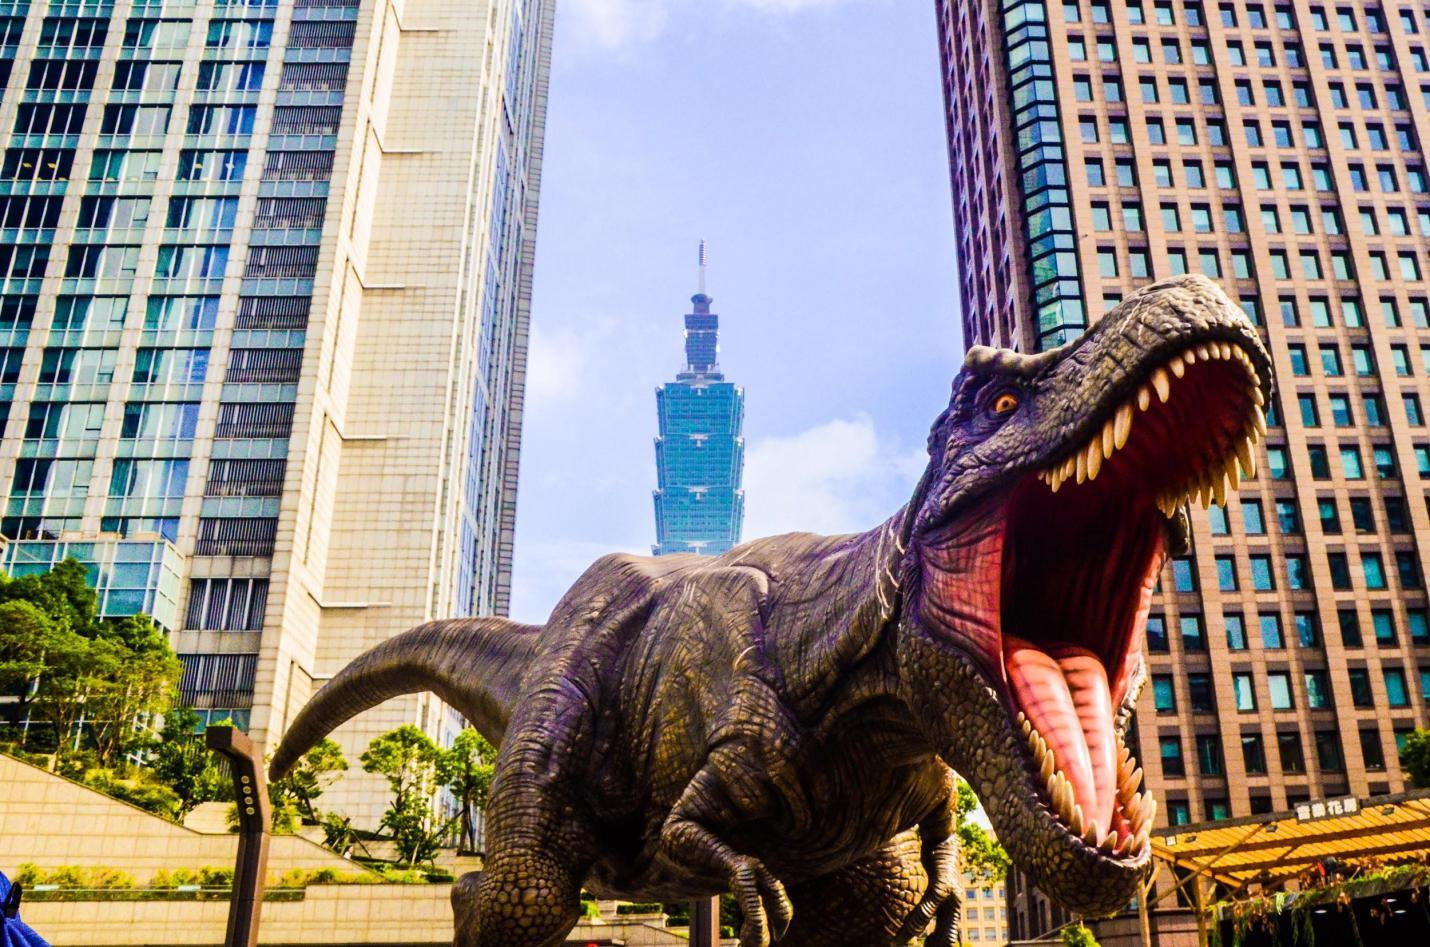 dinosaur-comics-roaring-T-Rex-in-the-city